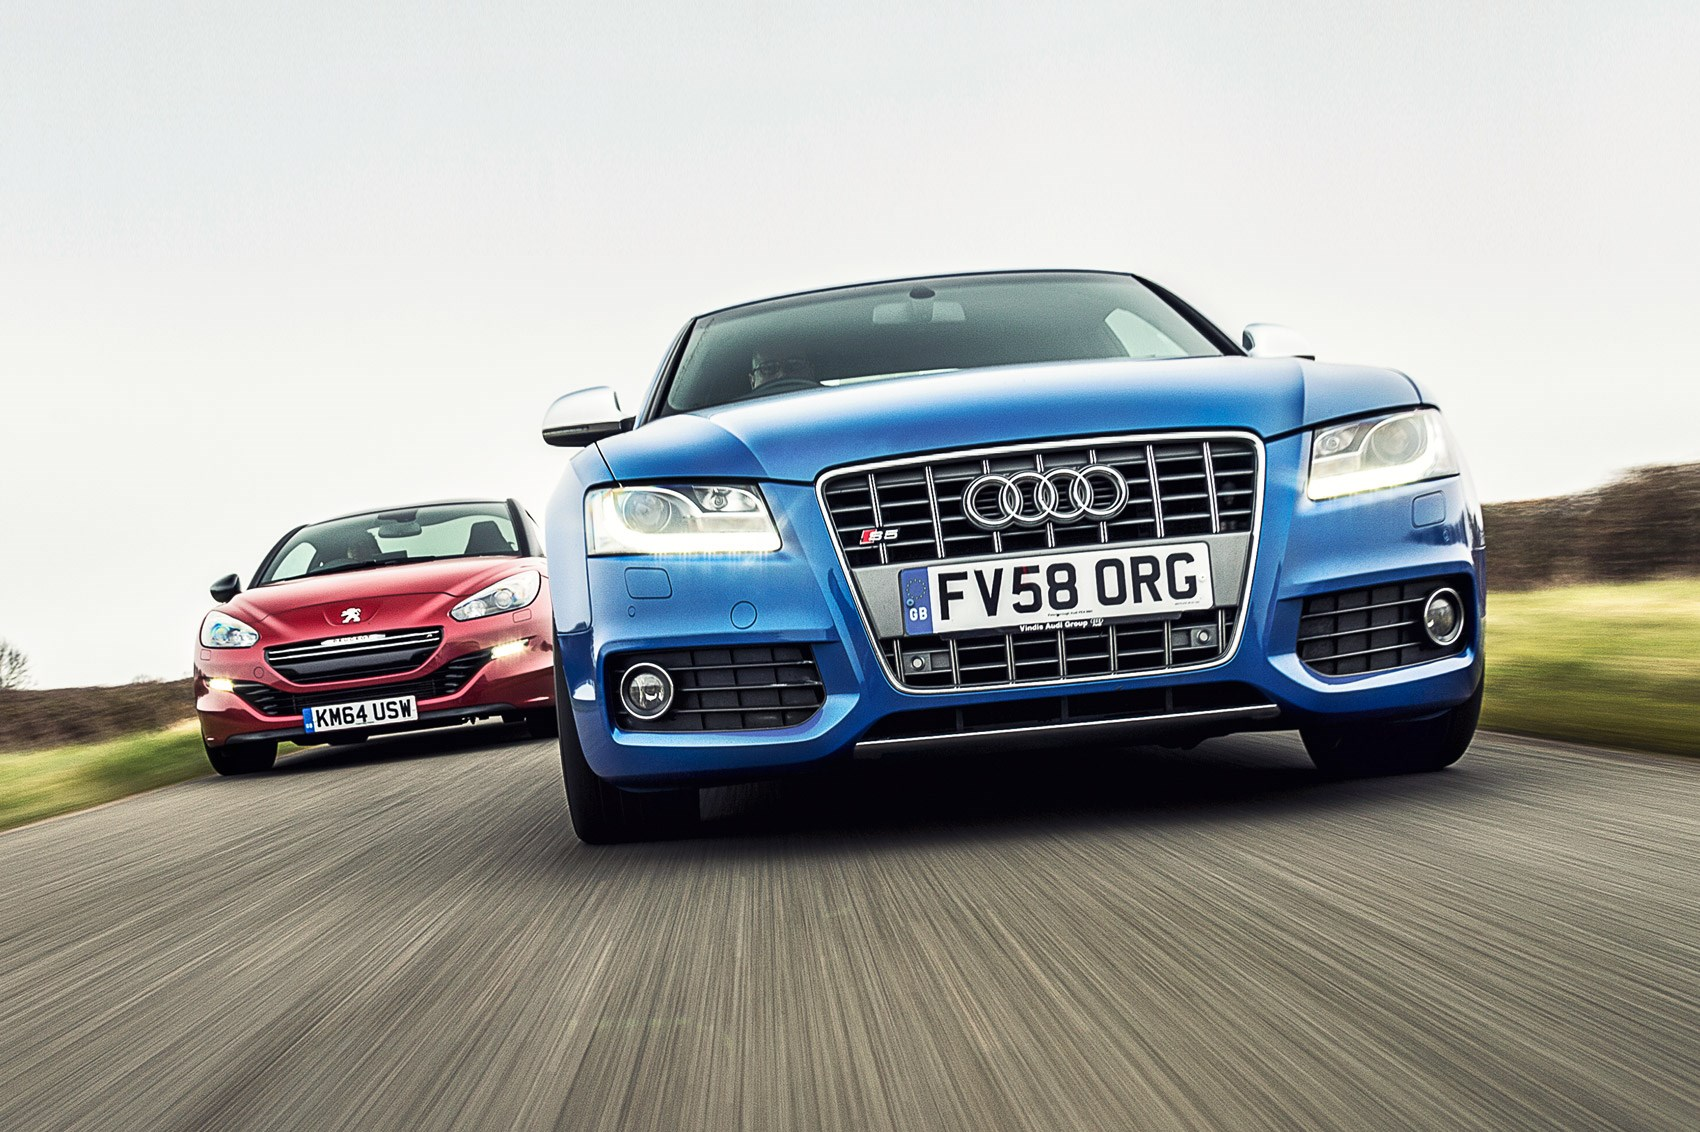 Used Car Stars 2016 Peugeot RCZ R Vs Audi S5 CAR June